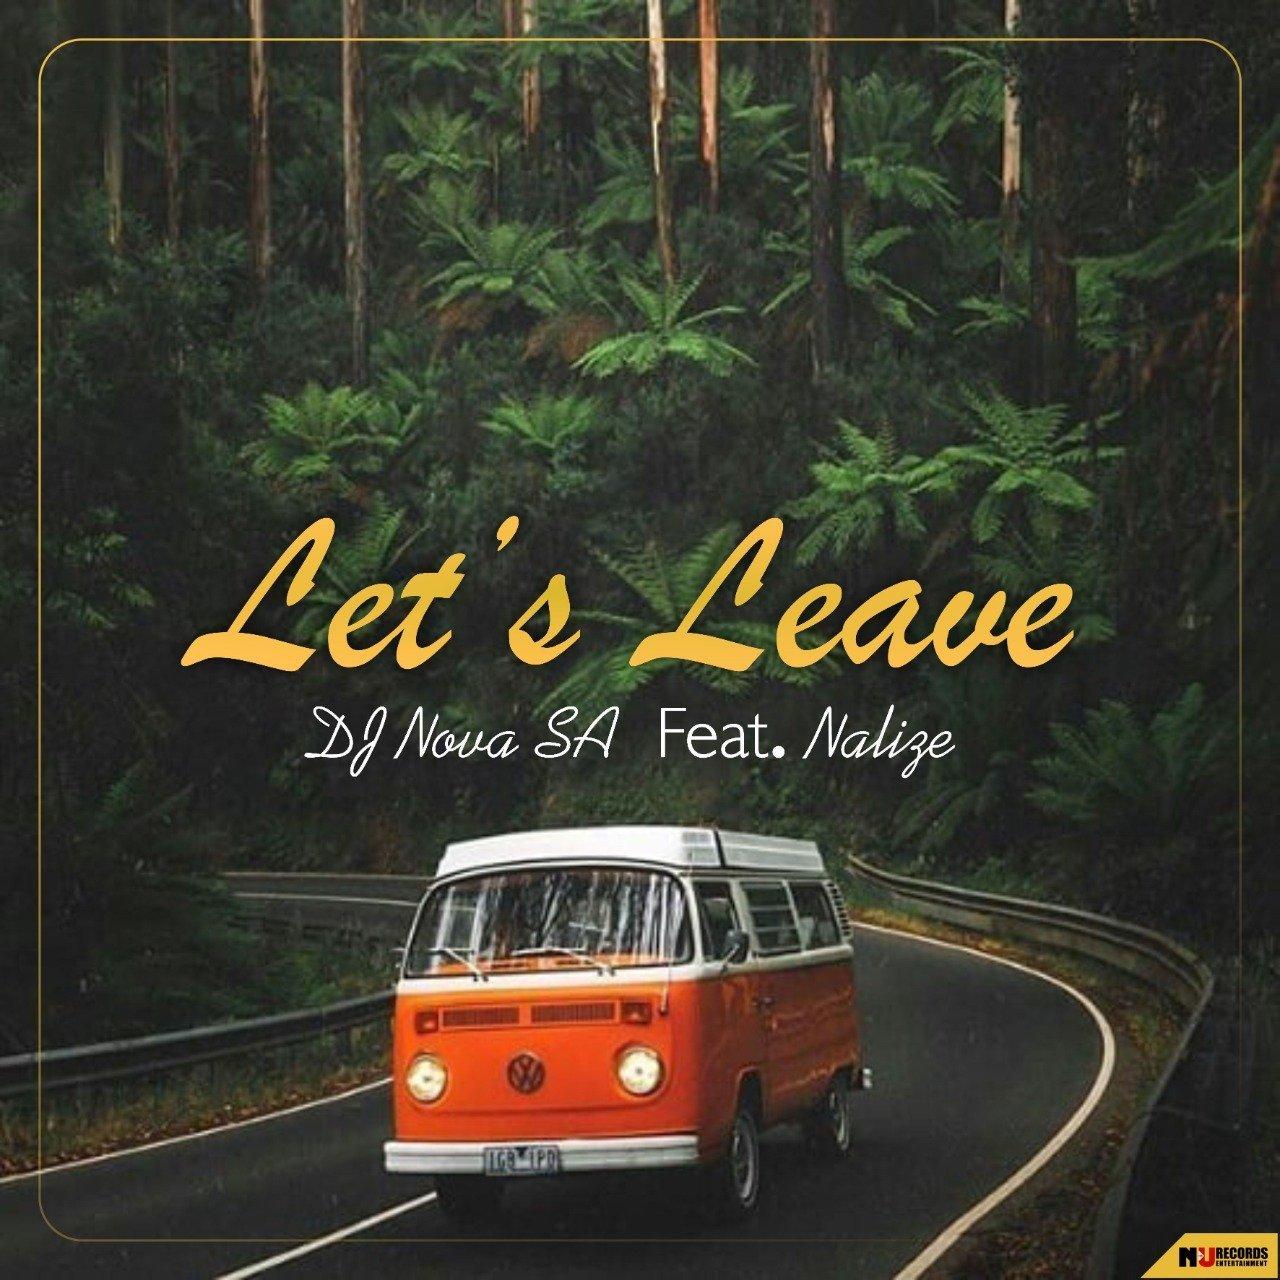 DJ Nova SA - Let's Leave feat Nalize